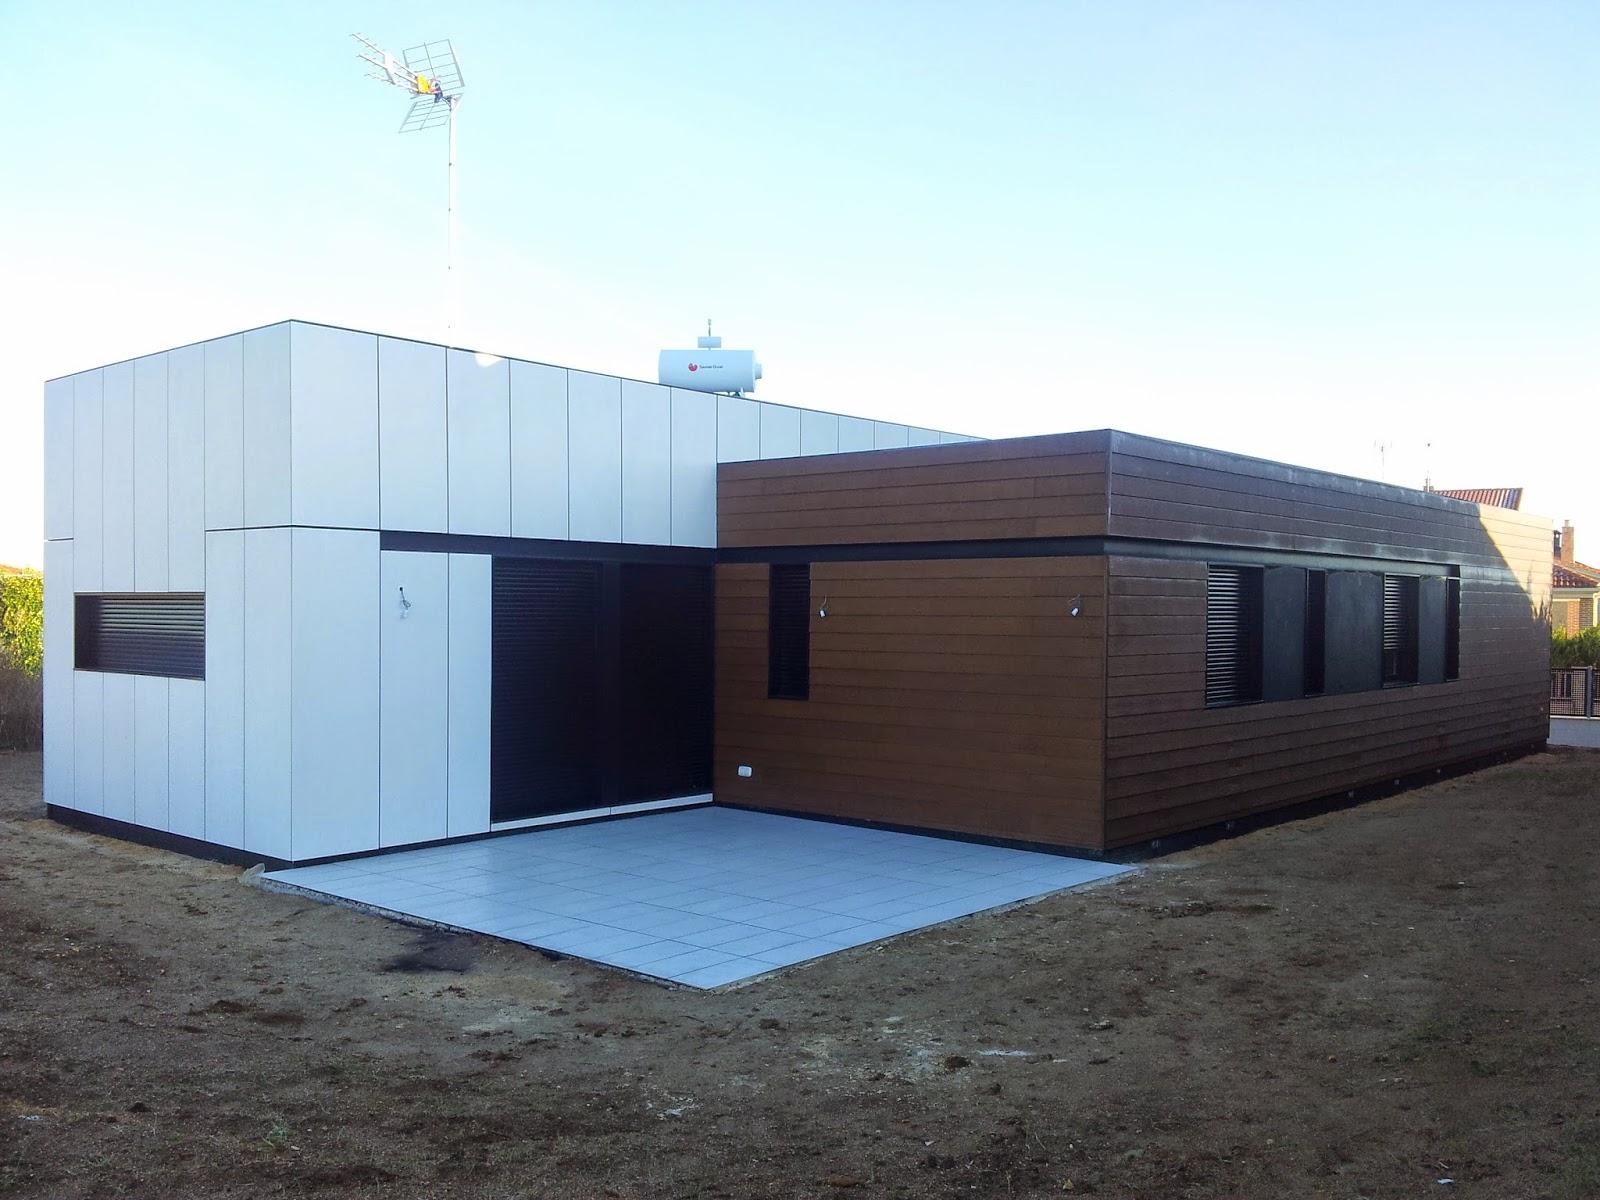 Fachada ventilada vivienda modular Resan